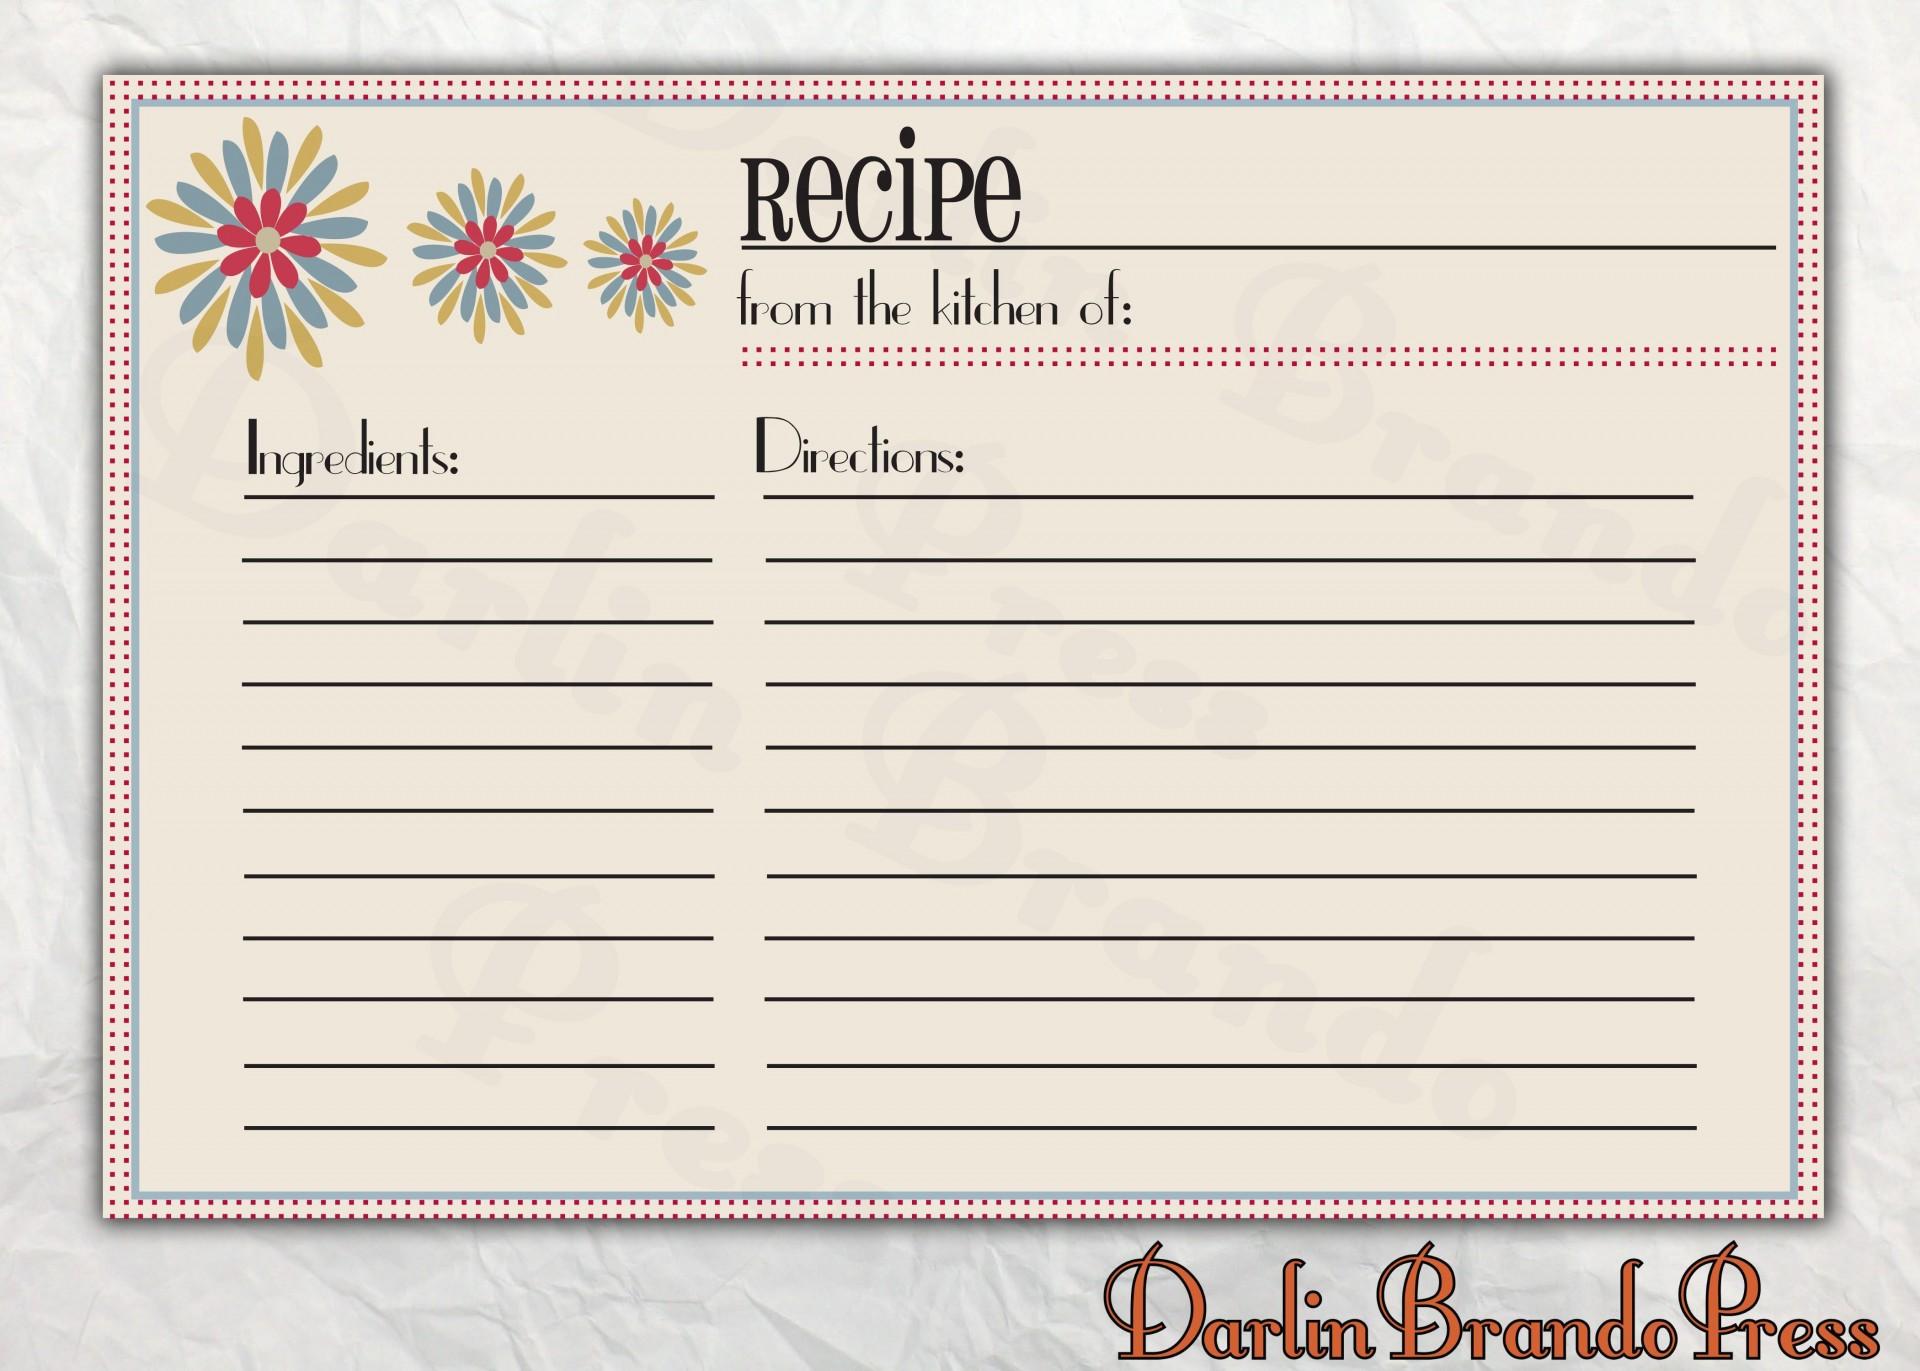 006 Astounding 4 X 6 Recipe Card Template Microsoft Word Inspiration 1920